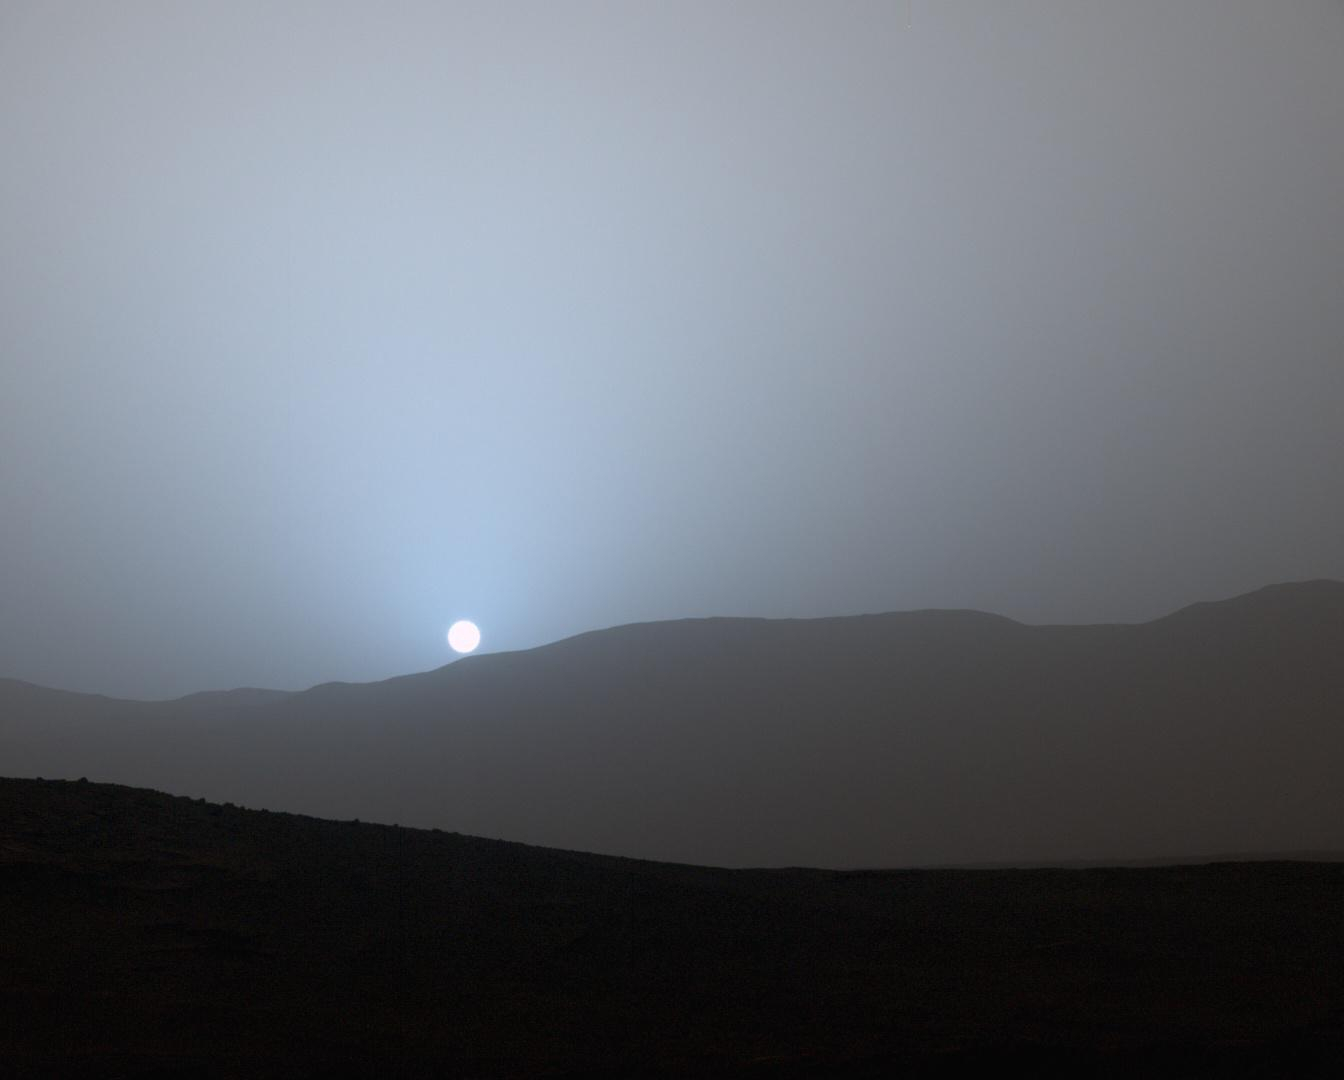 curiosity sunrise sunset times - HD1344×1080